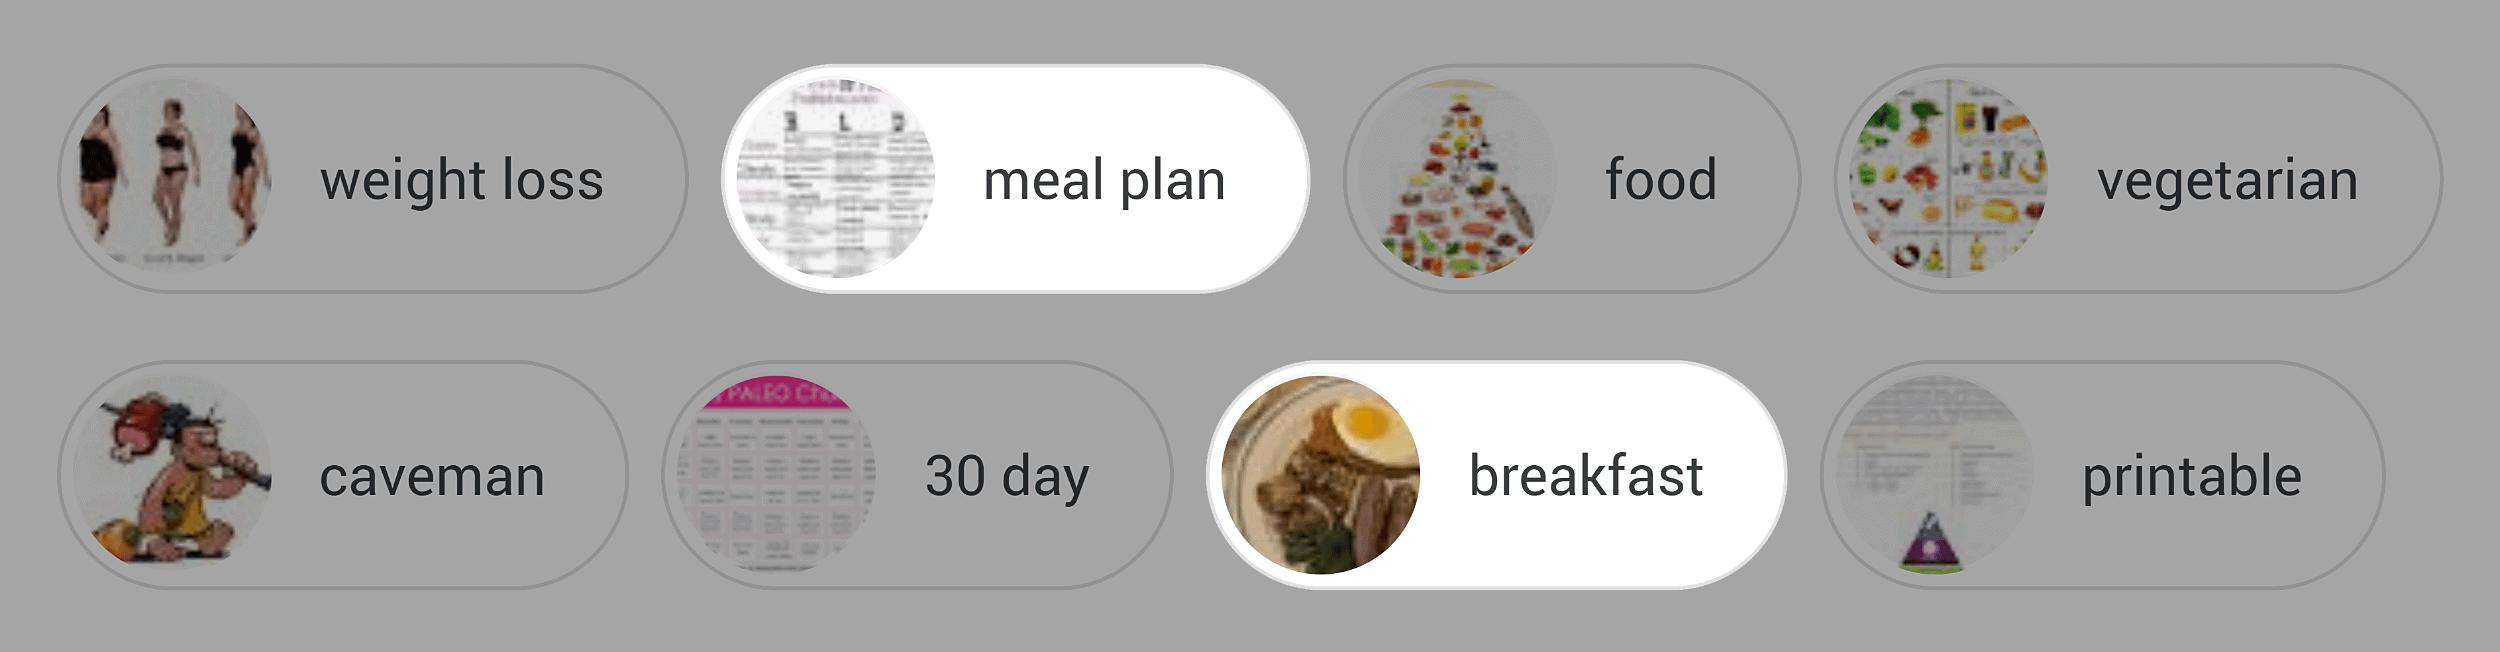 Google images – Paleo diet tags